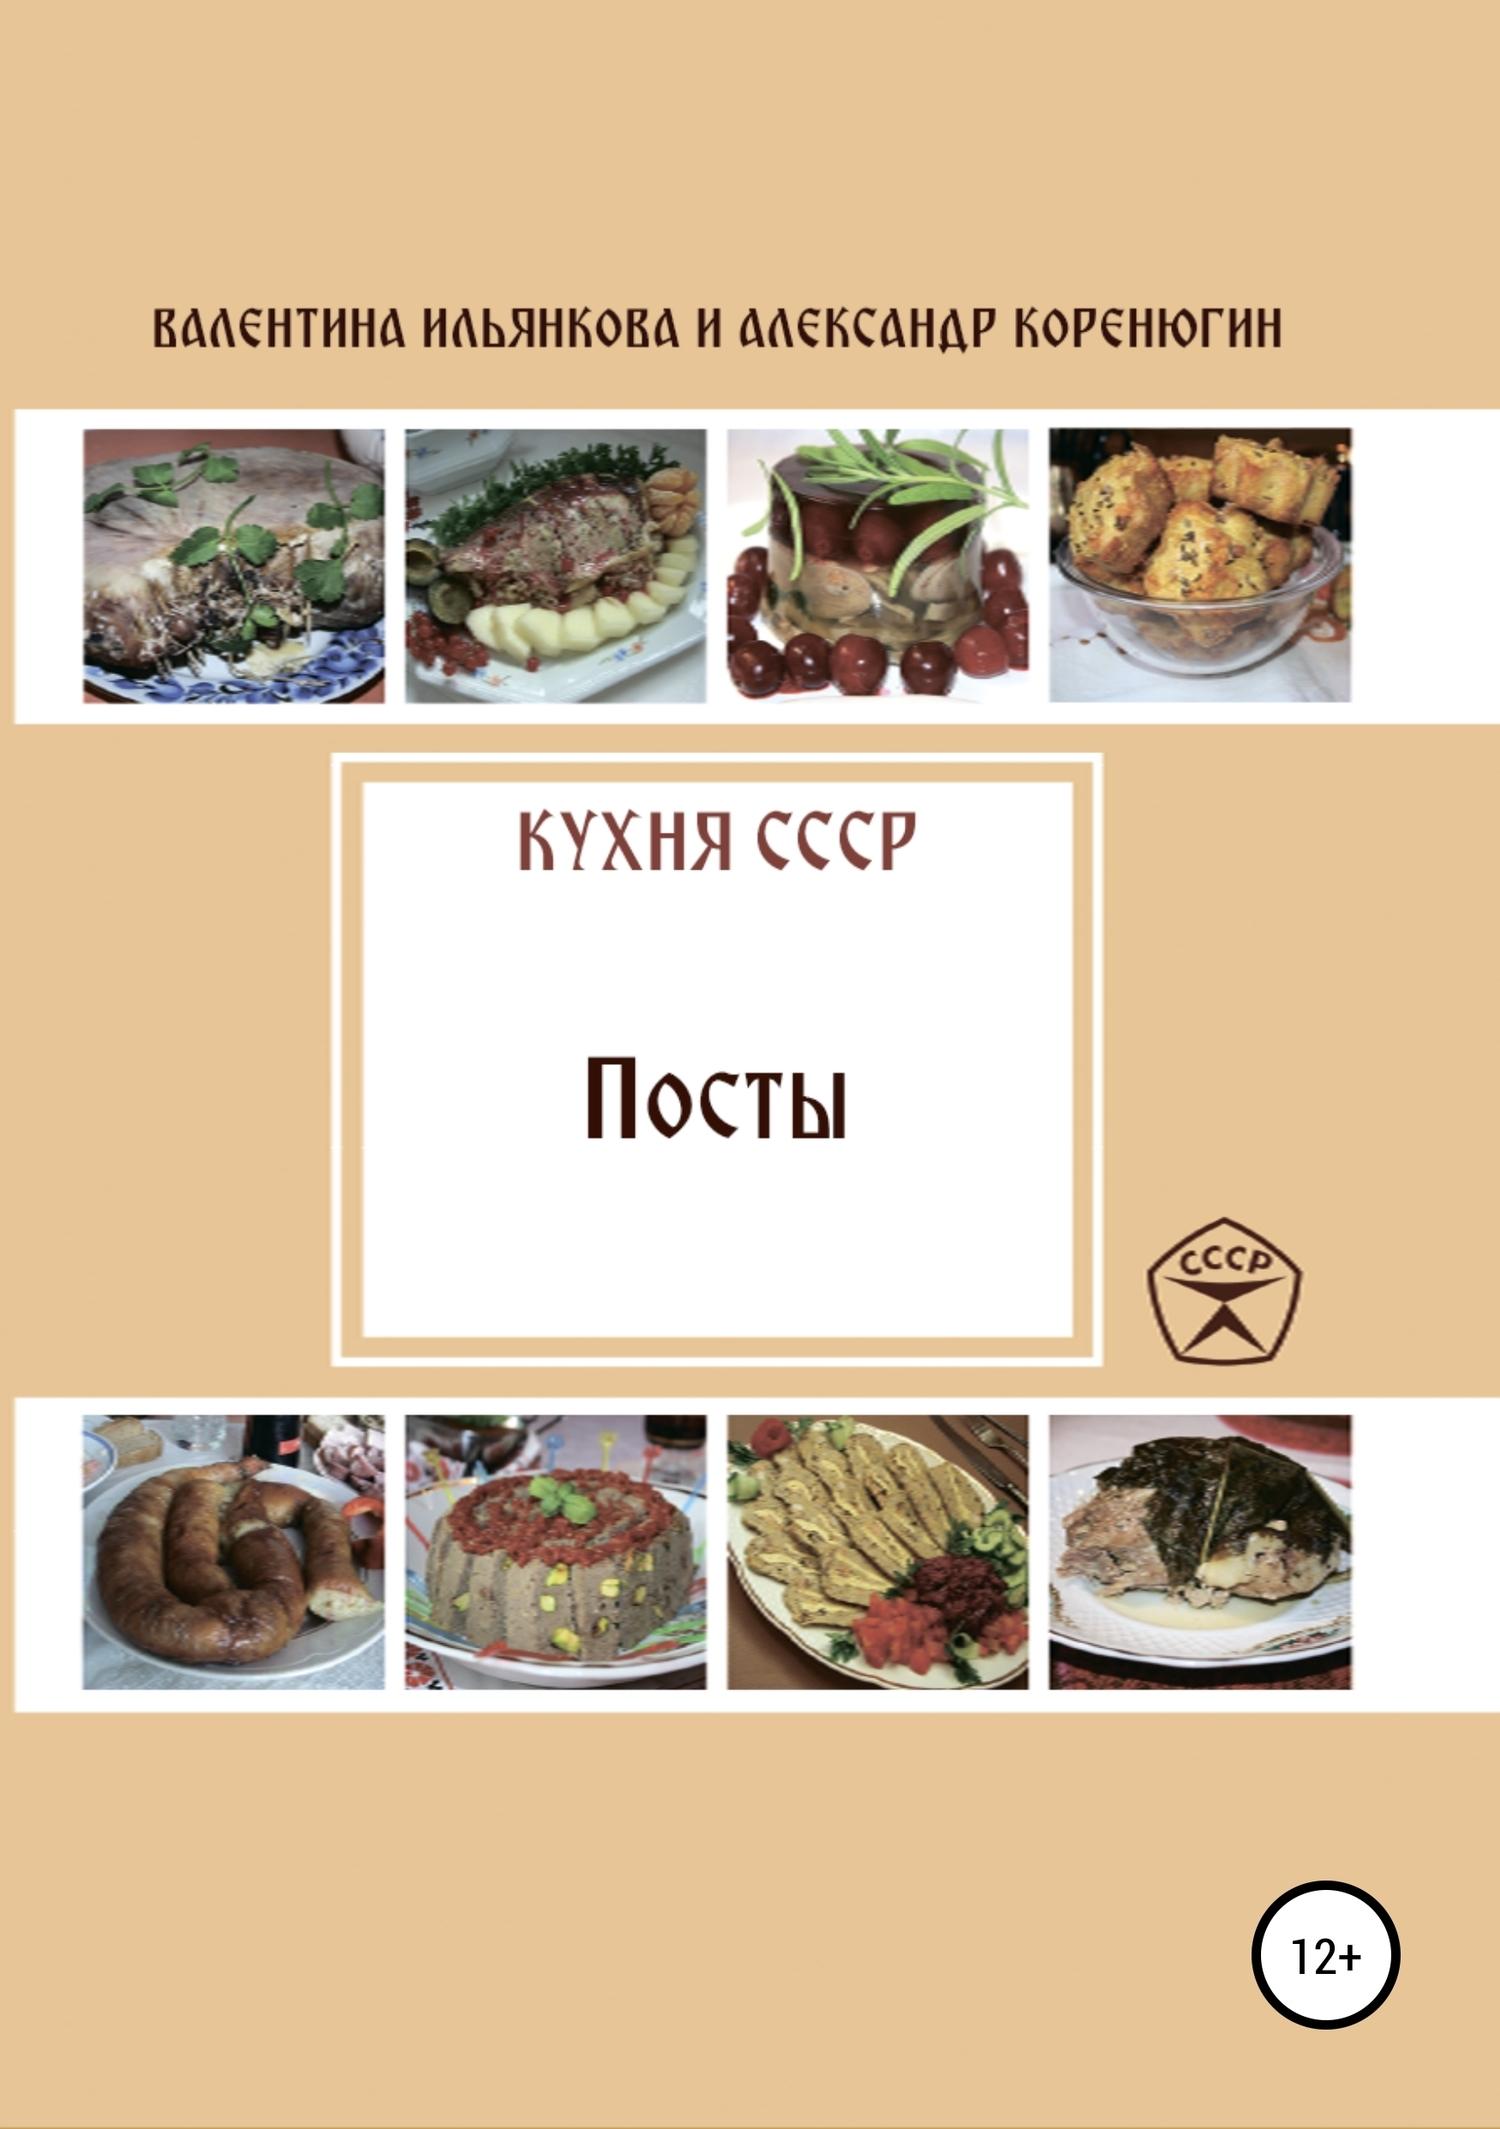 Александр Коренюгин, Валентина Ильянкова - Кухня СССР. Пост